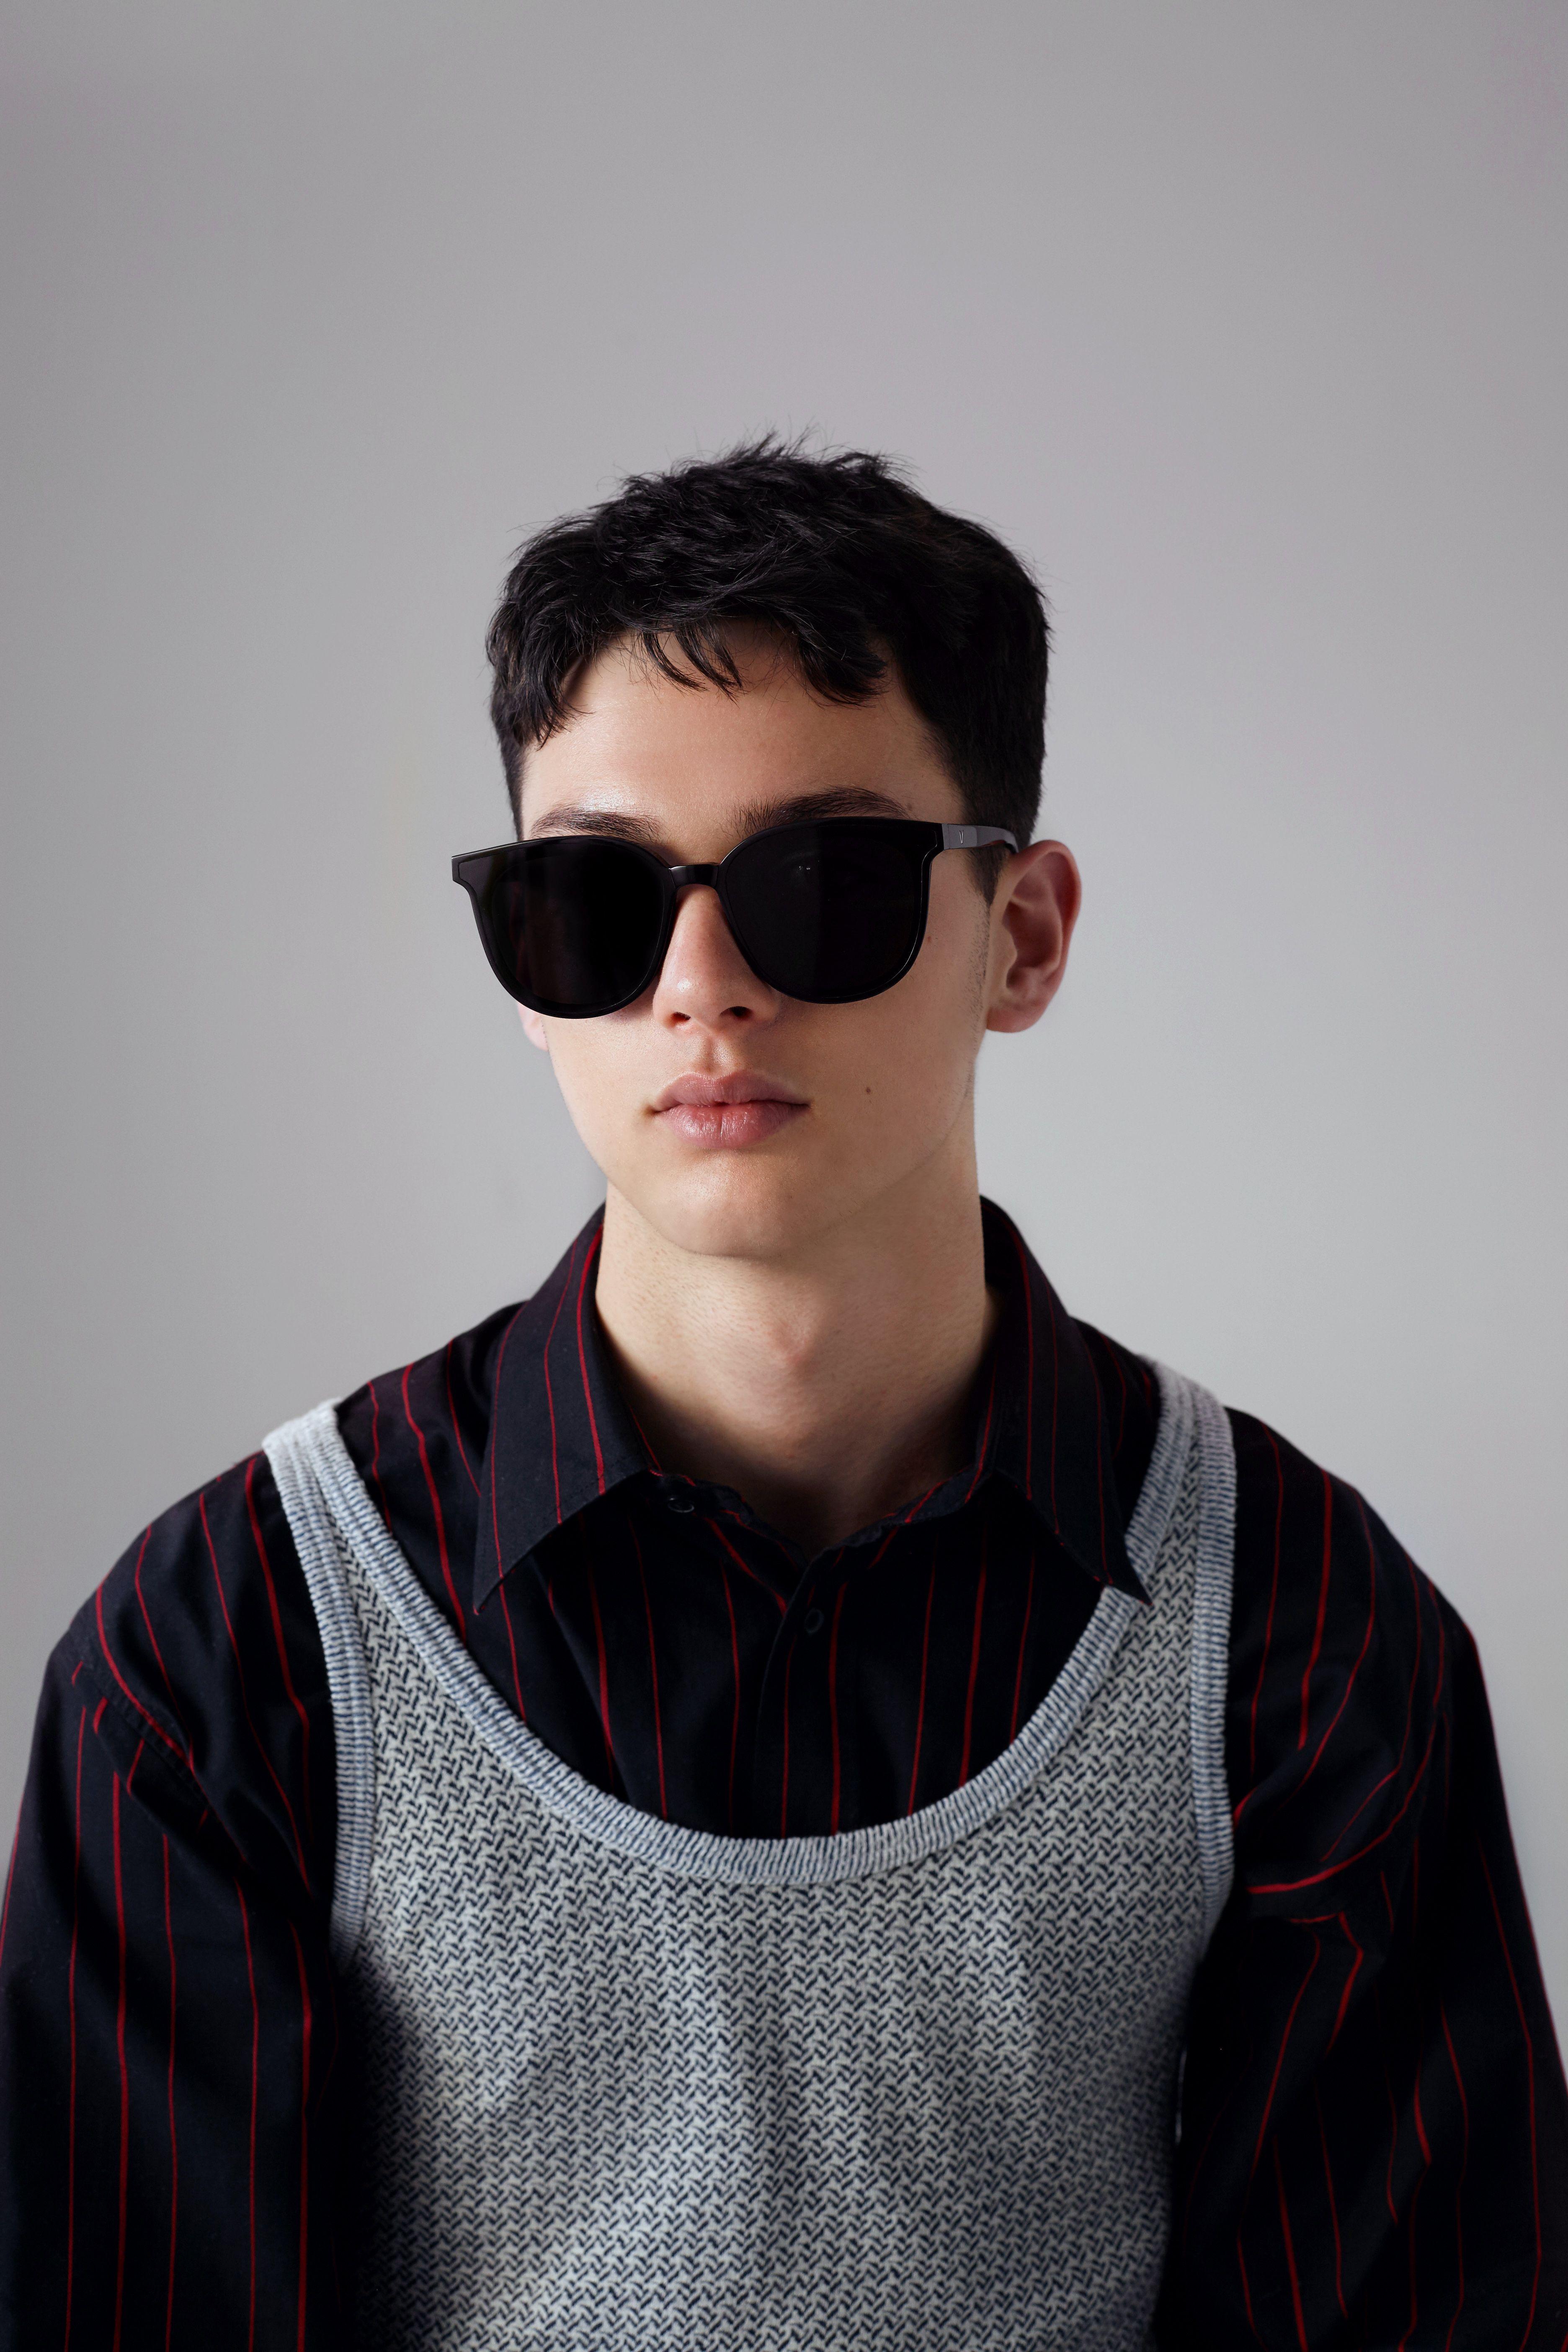 3fbef871f1e 2018 NEW SUNGLASSES LOOKBOOK Ma Mars 01  gentlemonster  sunglasses   lookbook  redwideopen  fashion  mamars